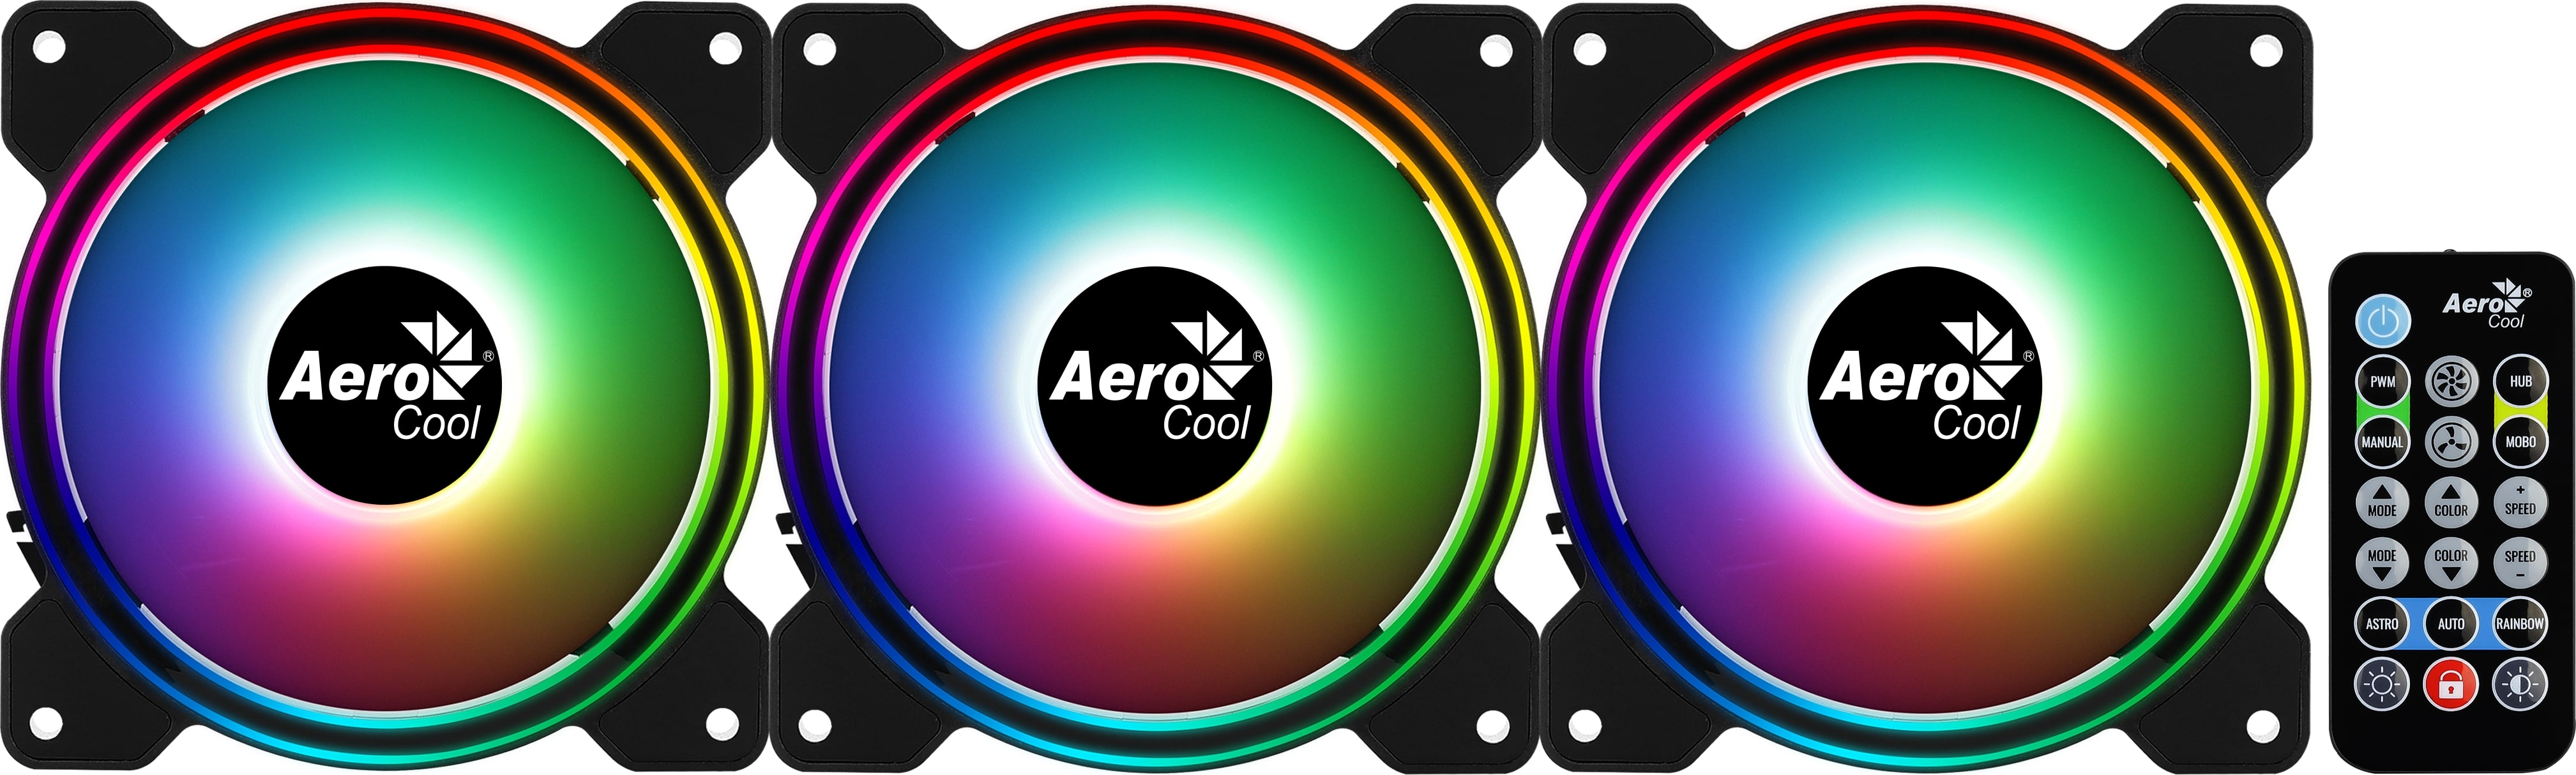 Ventilátor Aerocool Saturn 12F ARGB Pro 12cm RGB LED 3db-os + vezérlő (ACF3-ST10247.01)